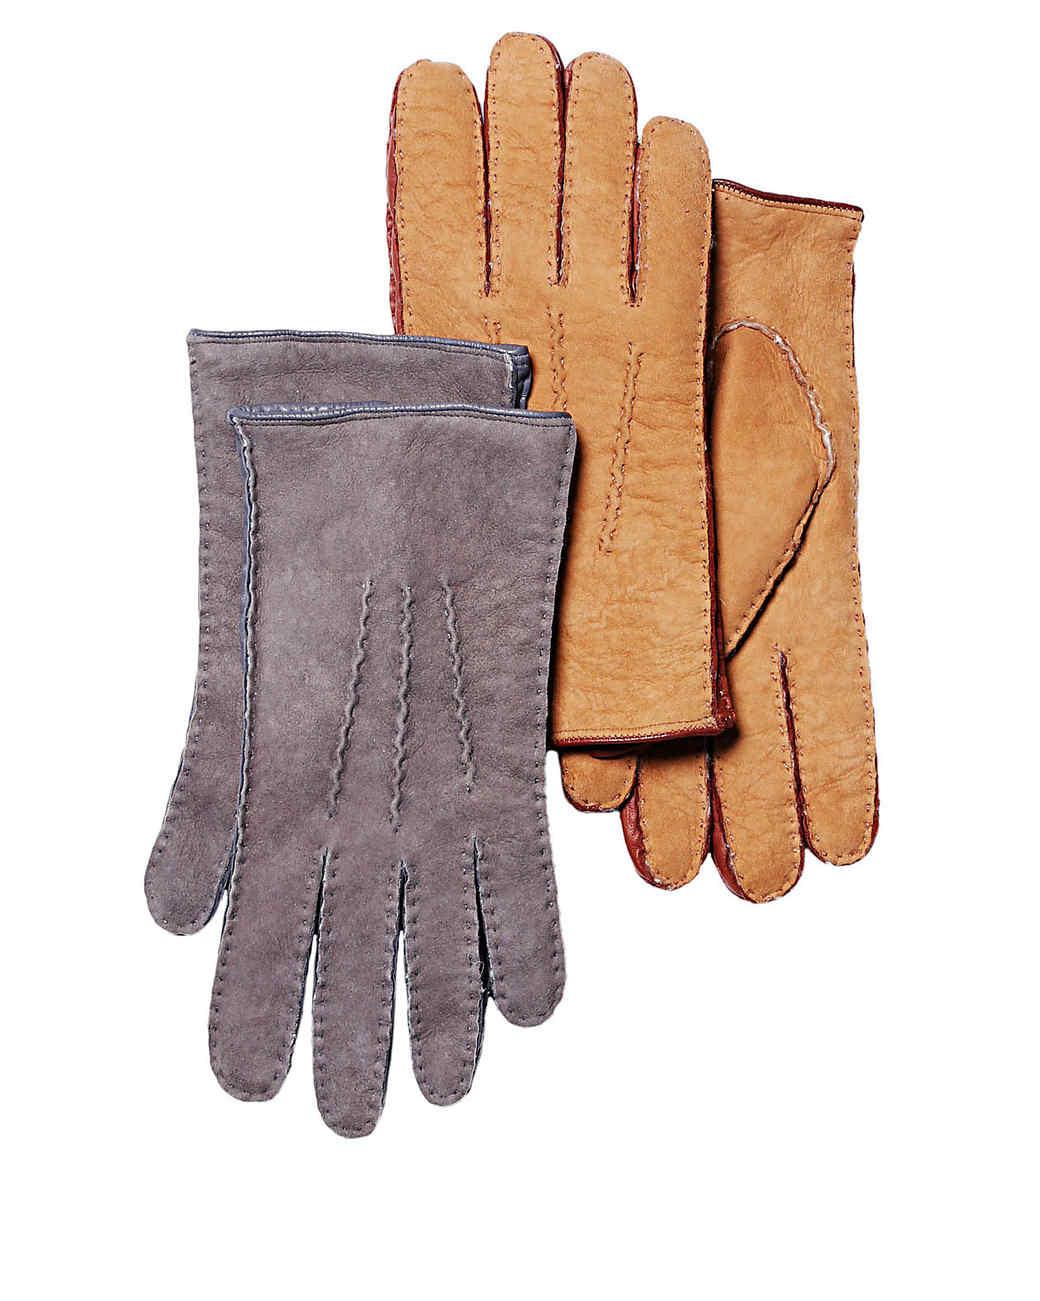 Garnet Hill shearling gloves